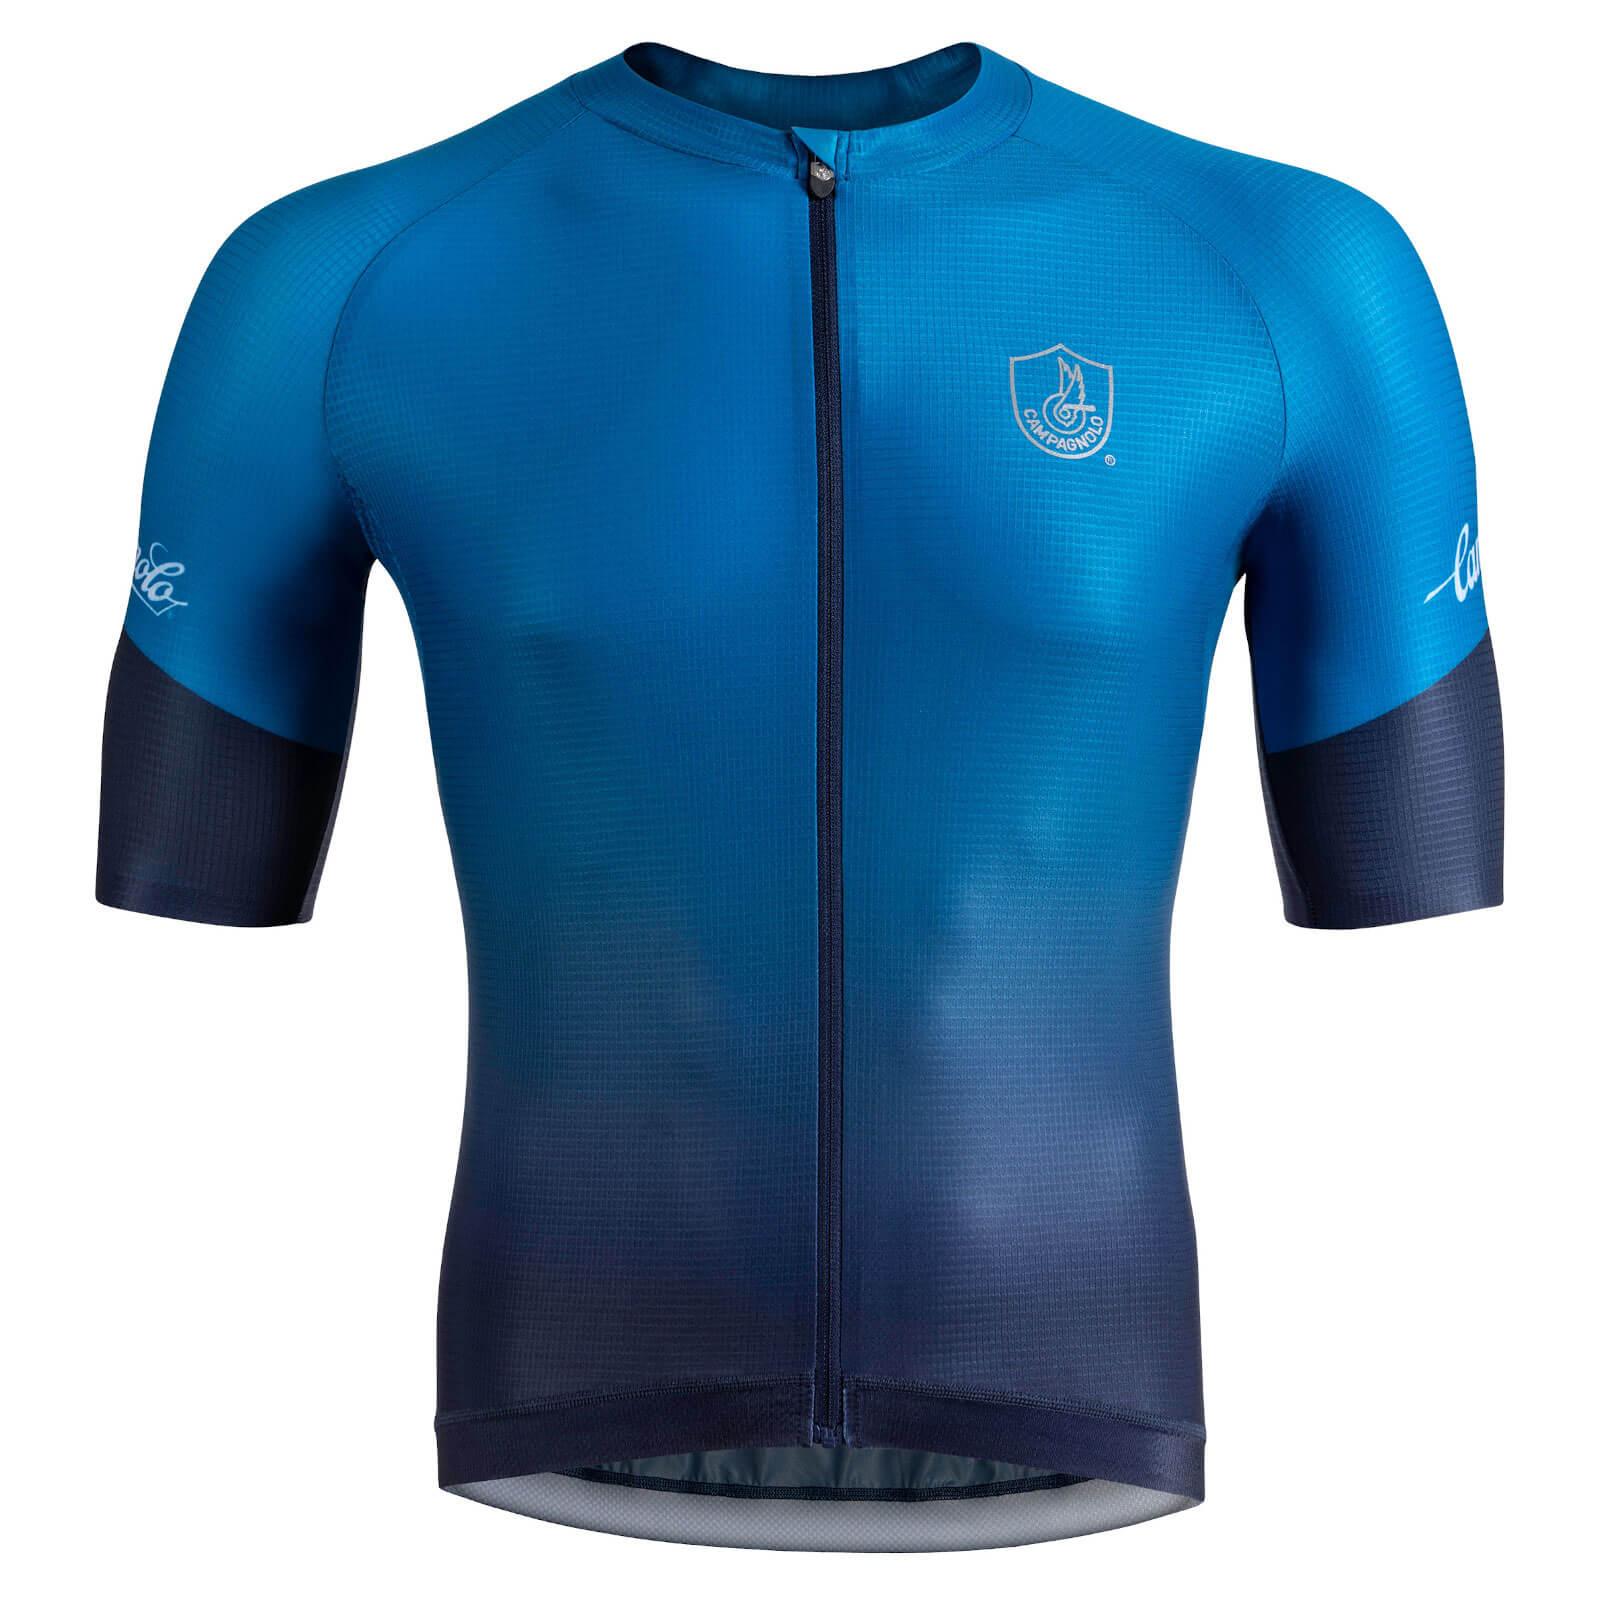 Nalini Campagnolo Platino Jersey - L - Blue/Navy Blue